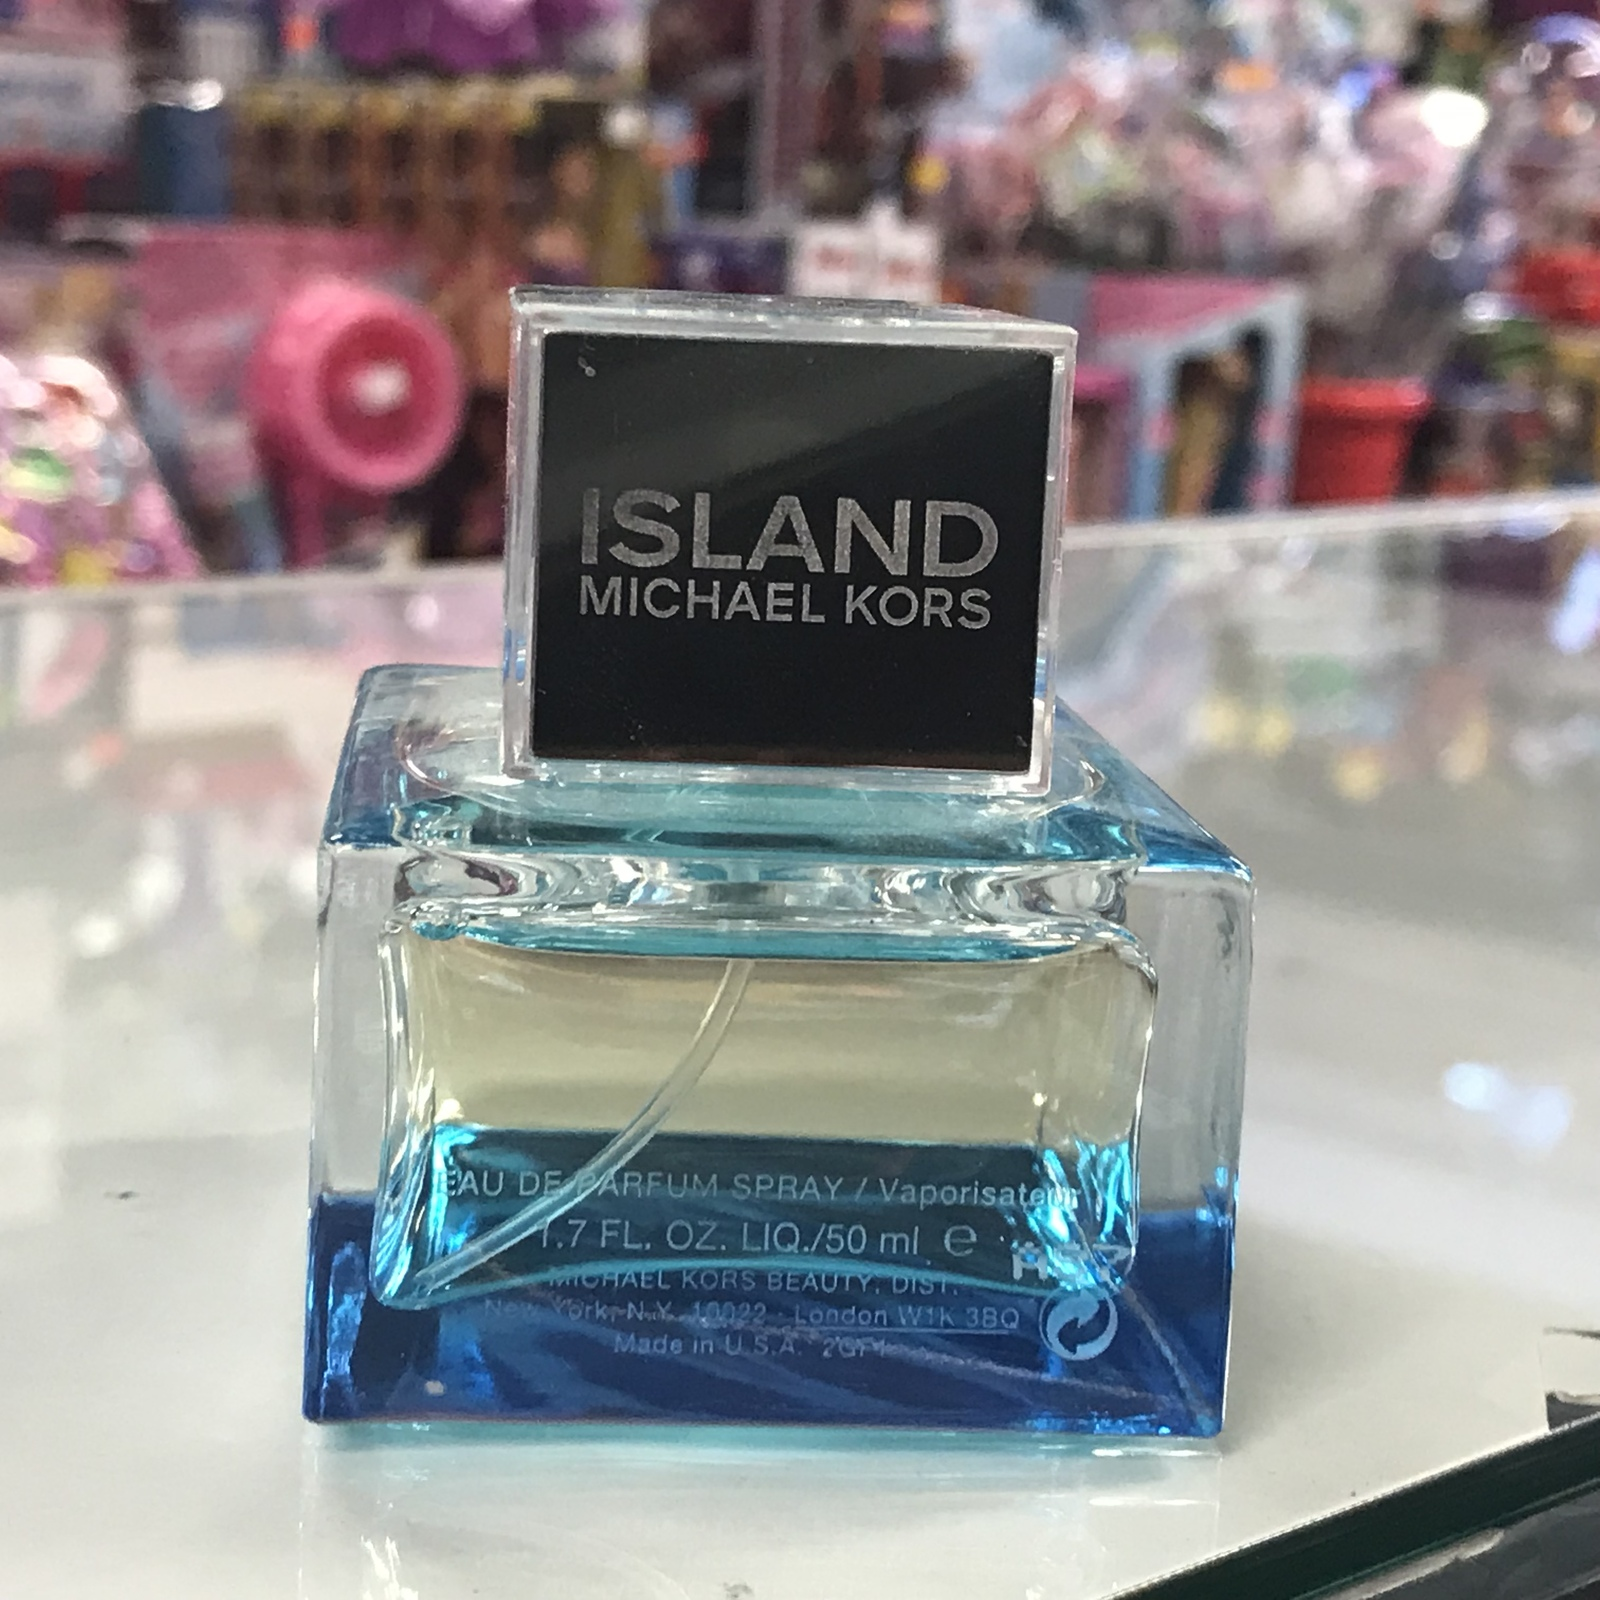 Island Capri BY Michael Kors for Women 1.7 fl.oz / 50 ml eau de Parfum Spray